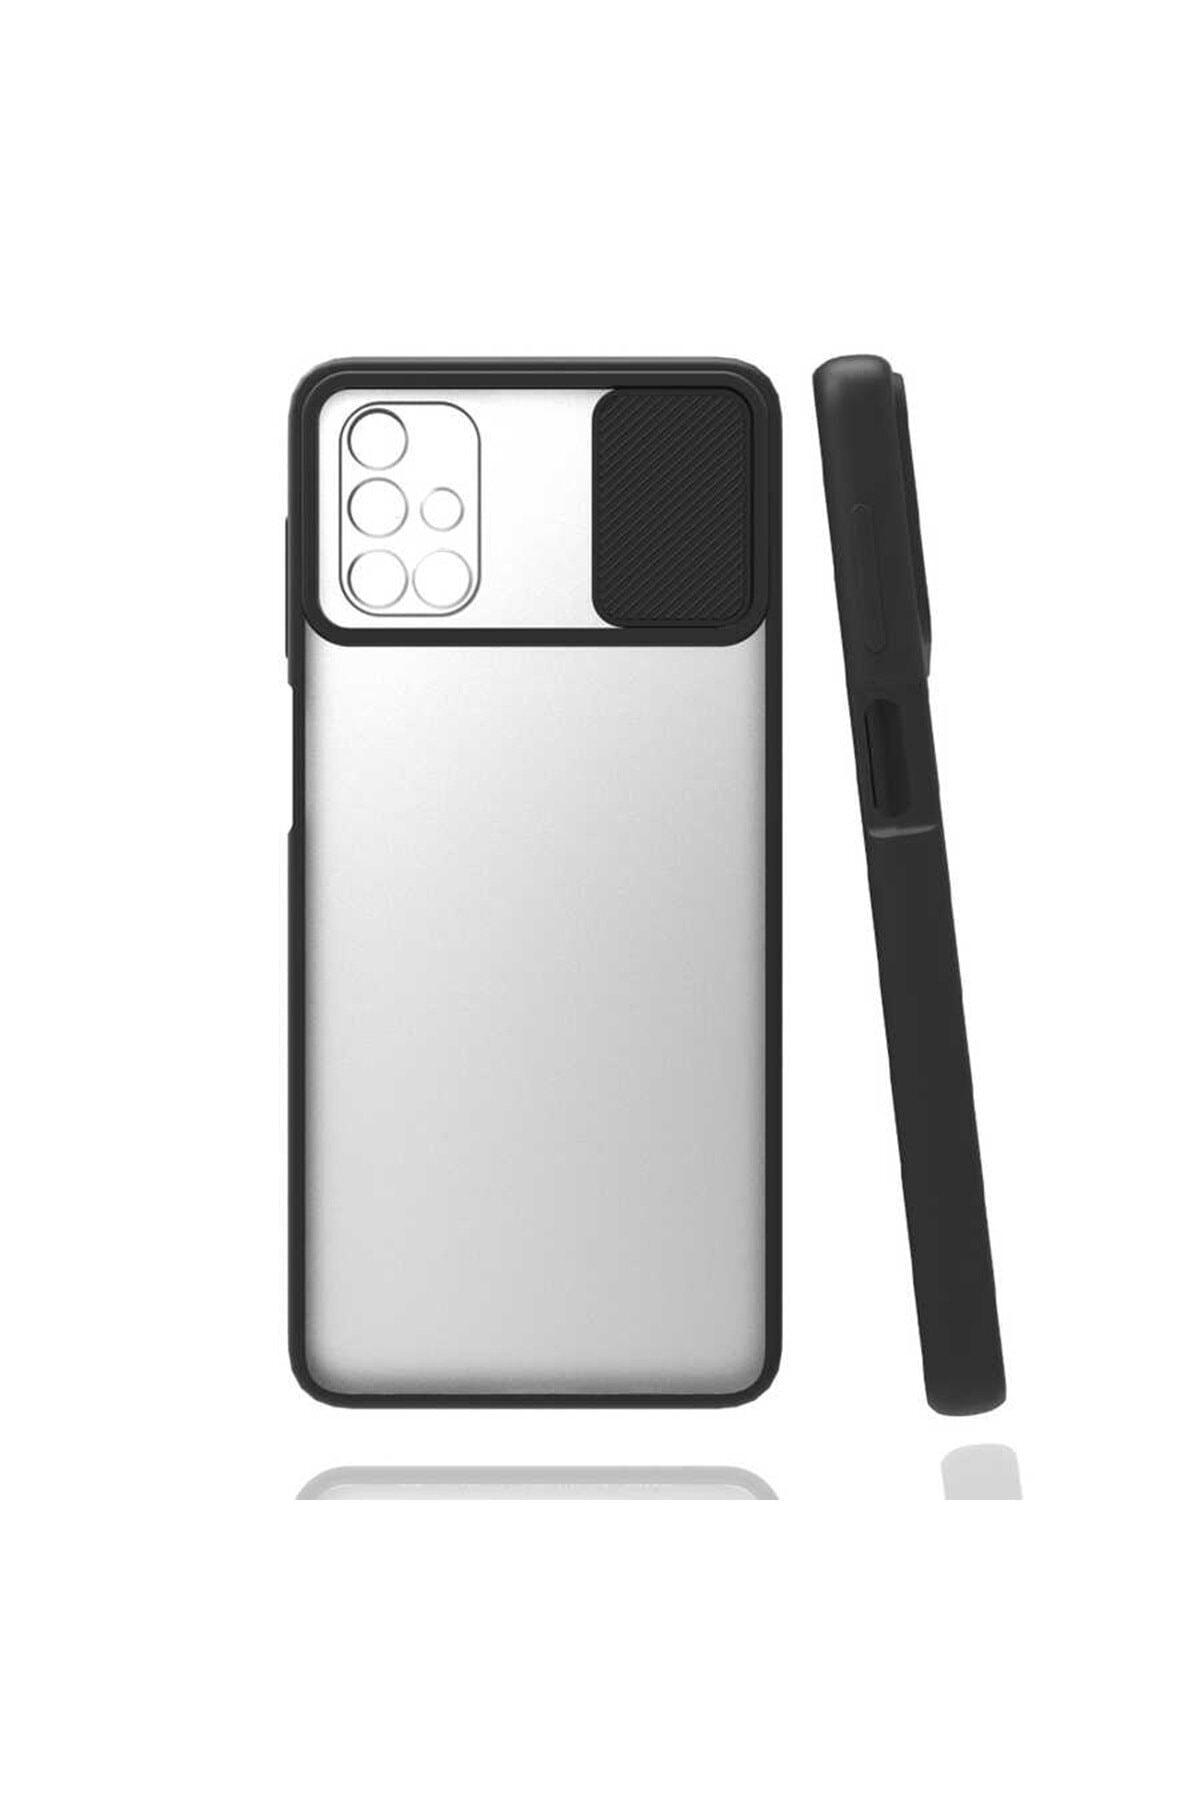 zore Galaxy M51 Kılıf Lensi Kapak Siyah Kılıf Samsung M51 1